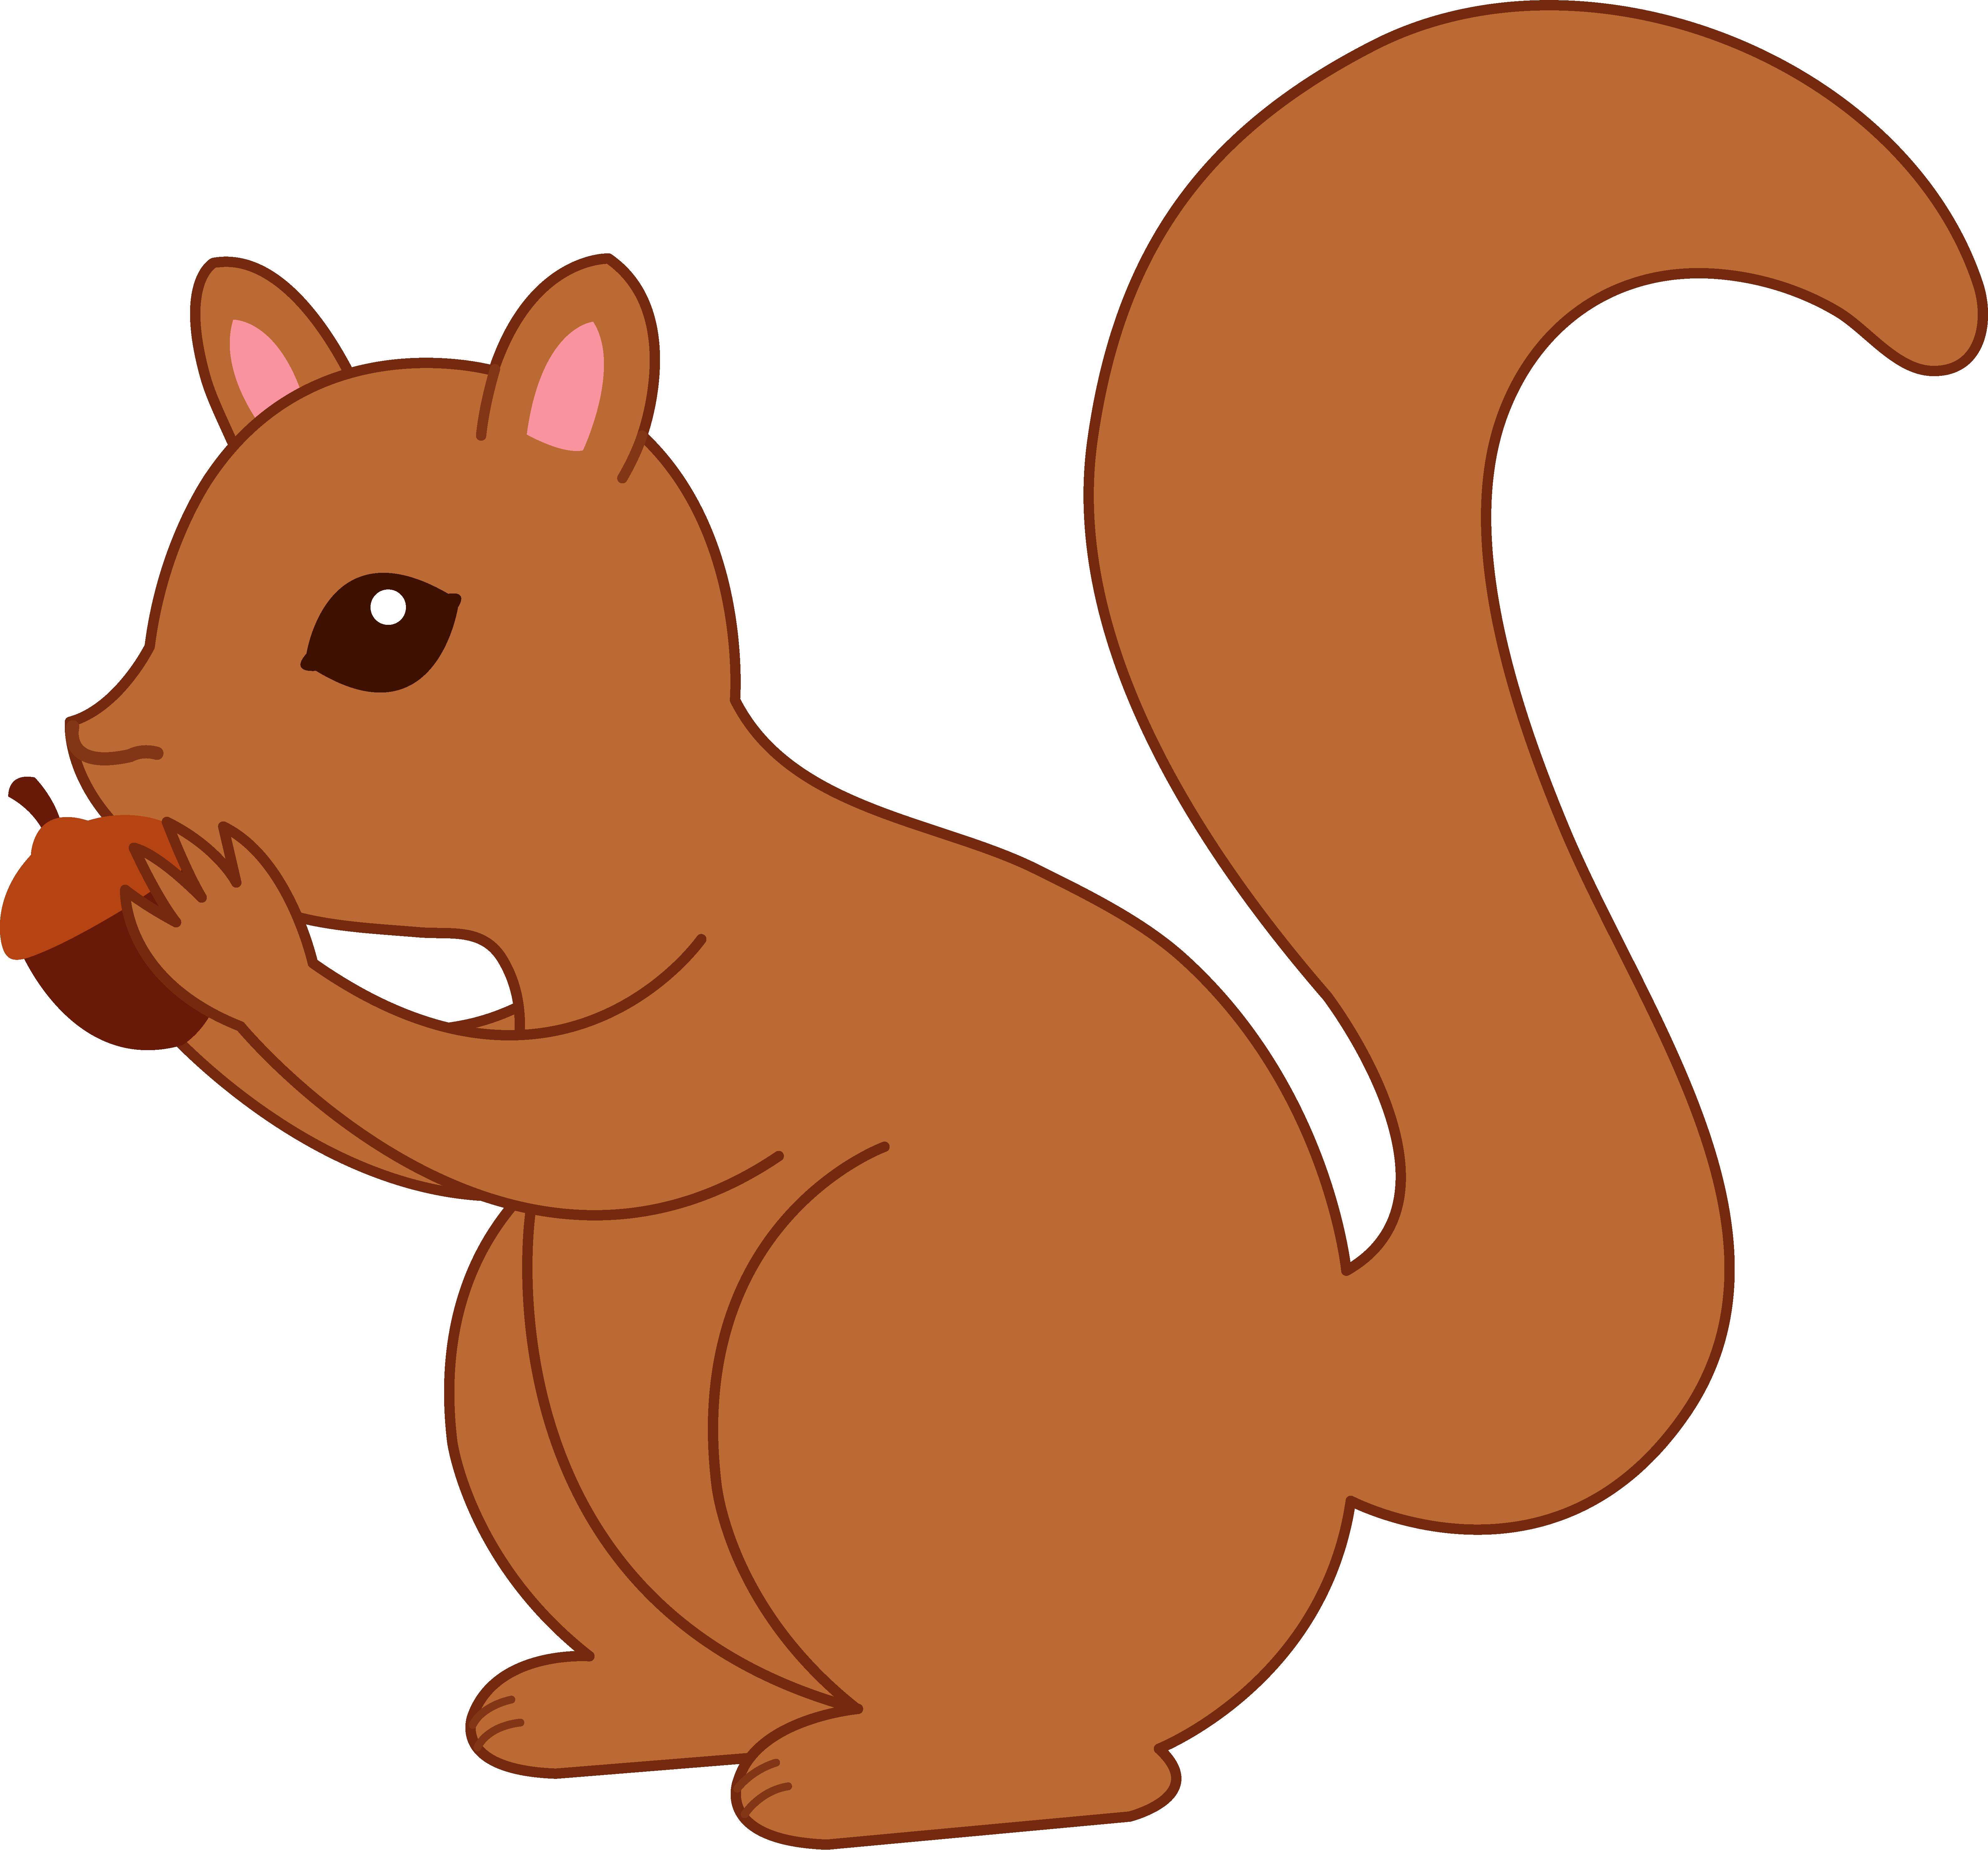 Baby squirrel panda free. Nut clipart cute